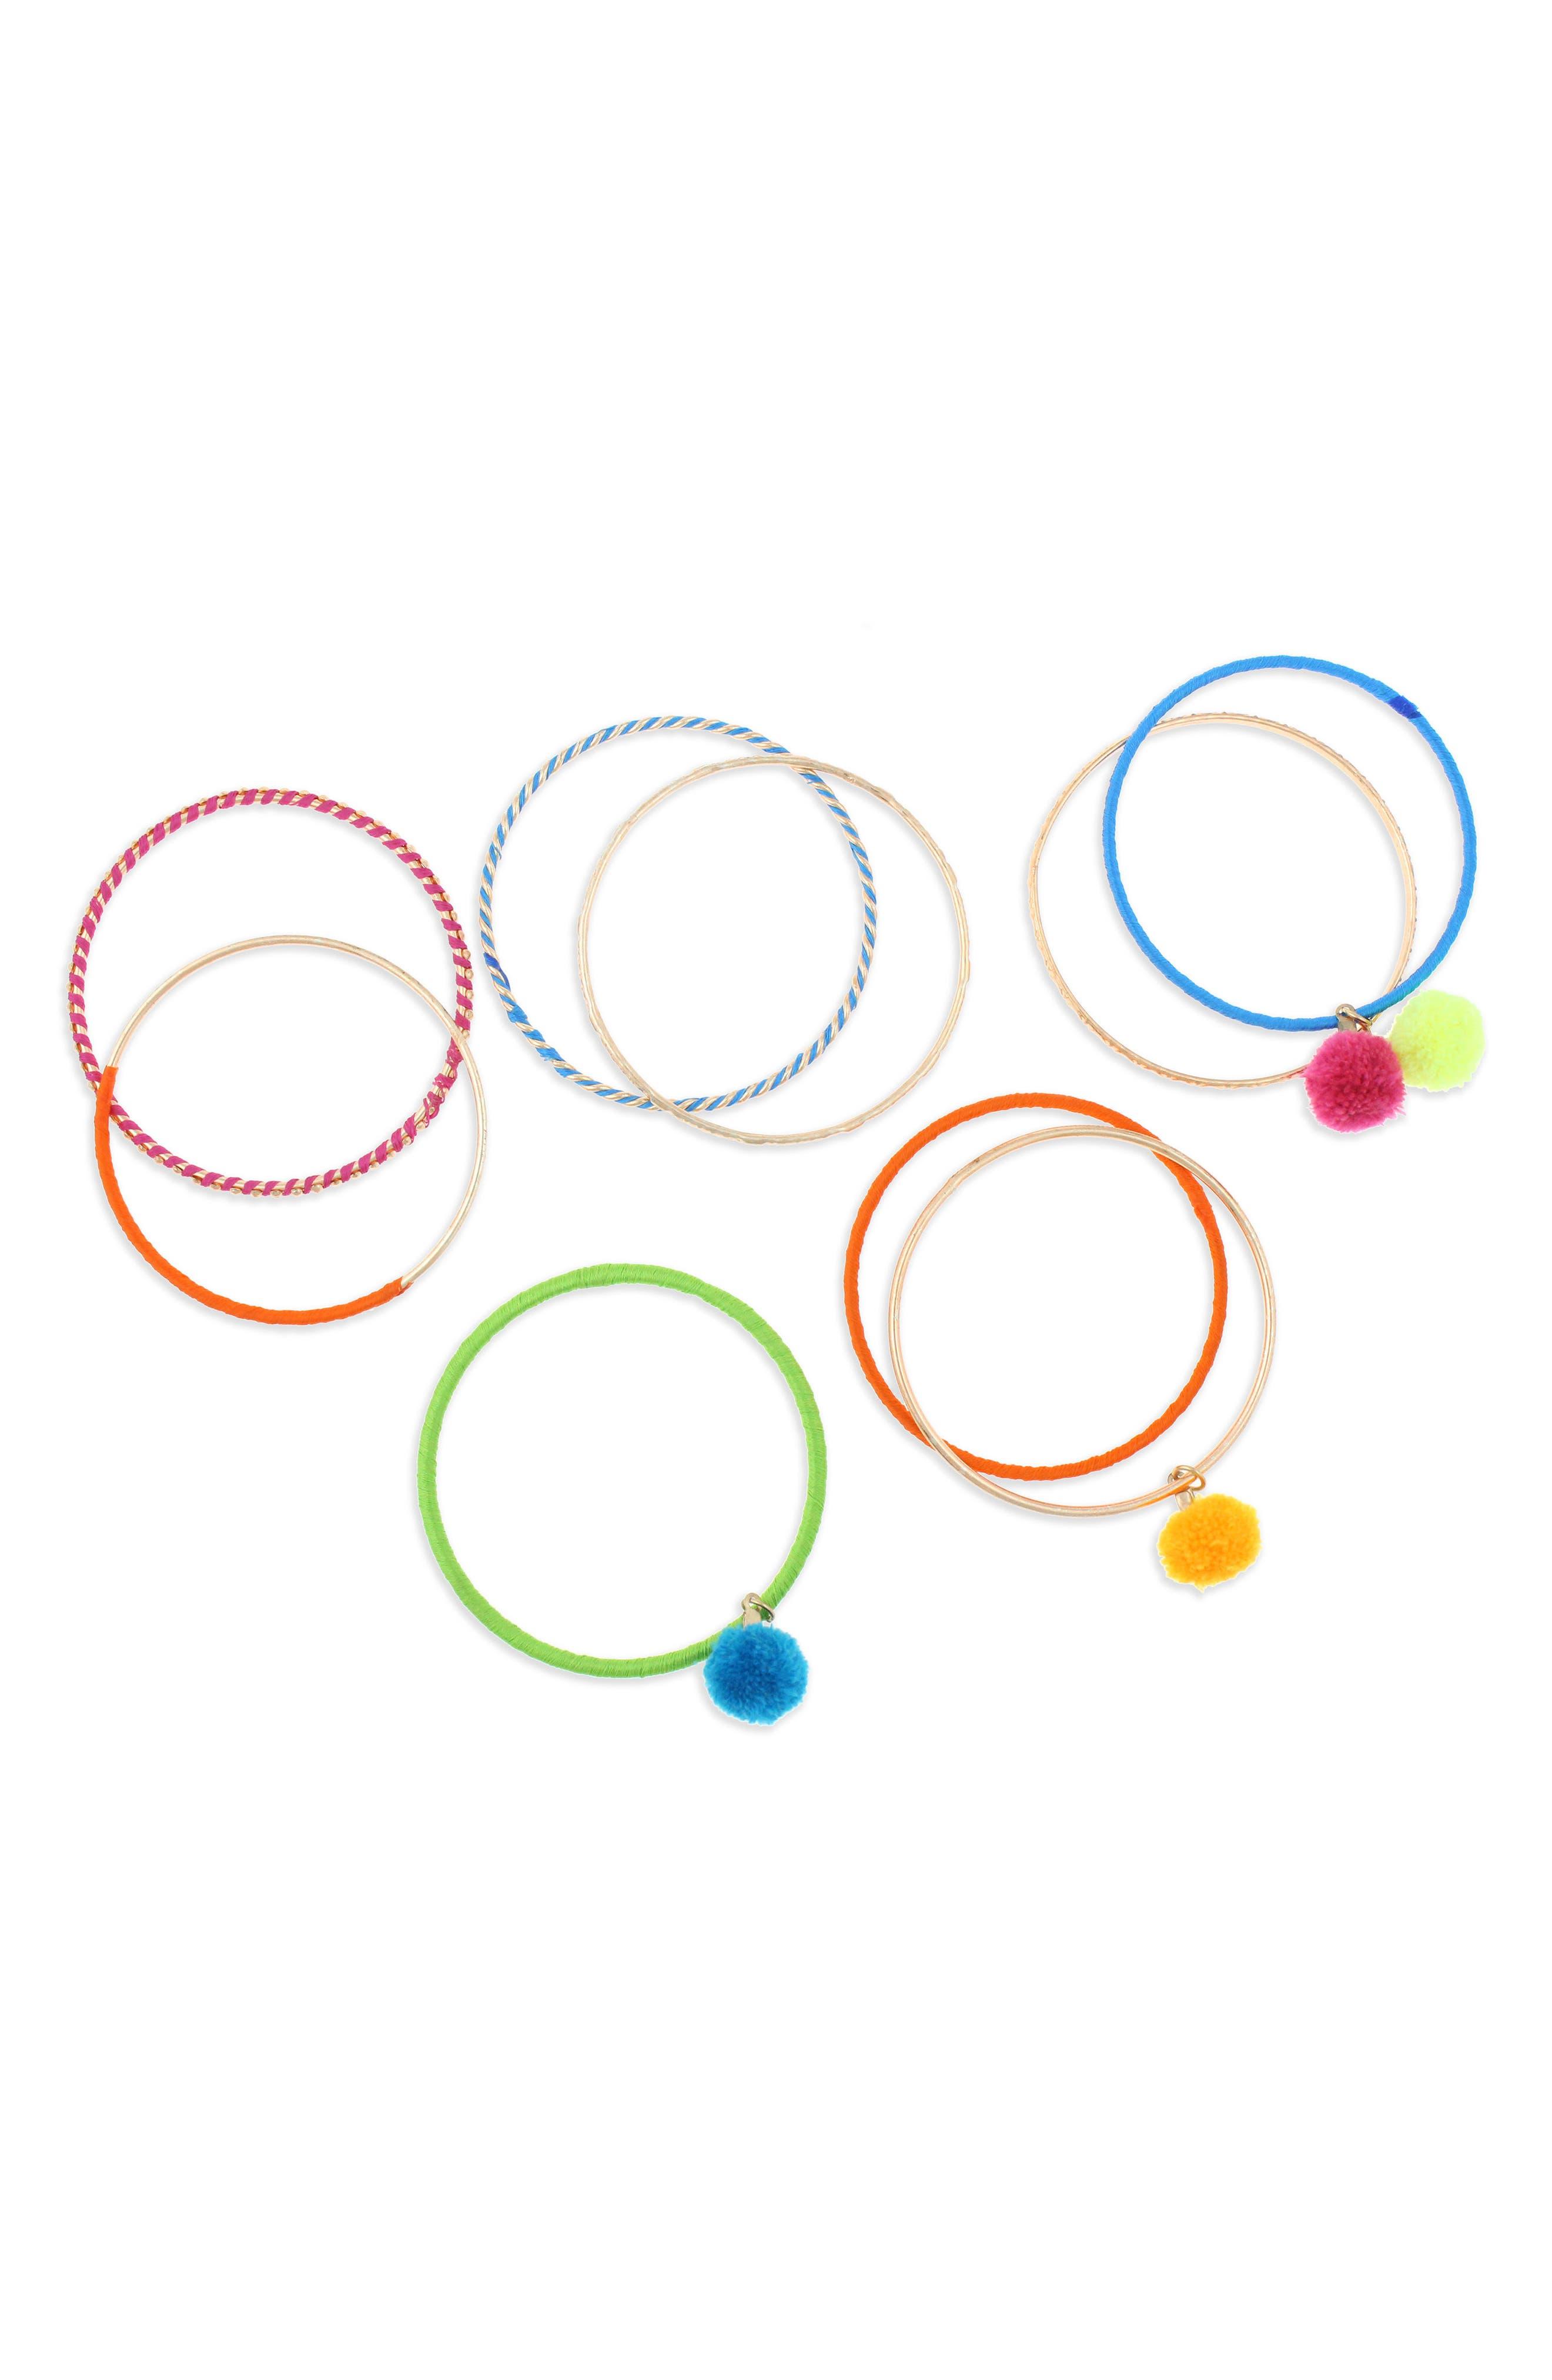 Set of 9 Bangle Bracelets,                             Alternate thumbnail 2, color,                             715